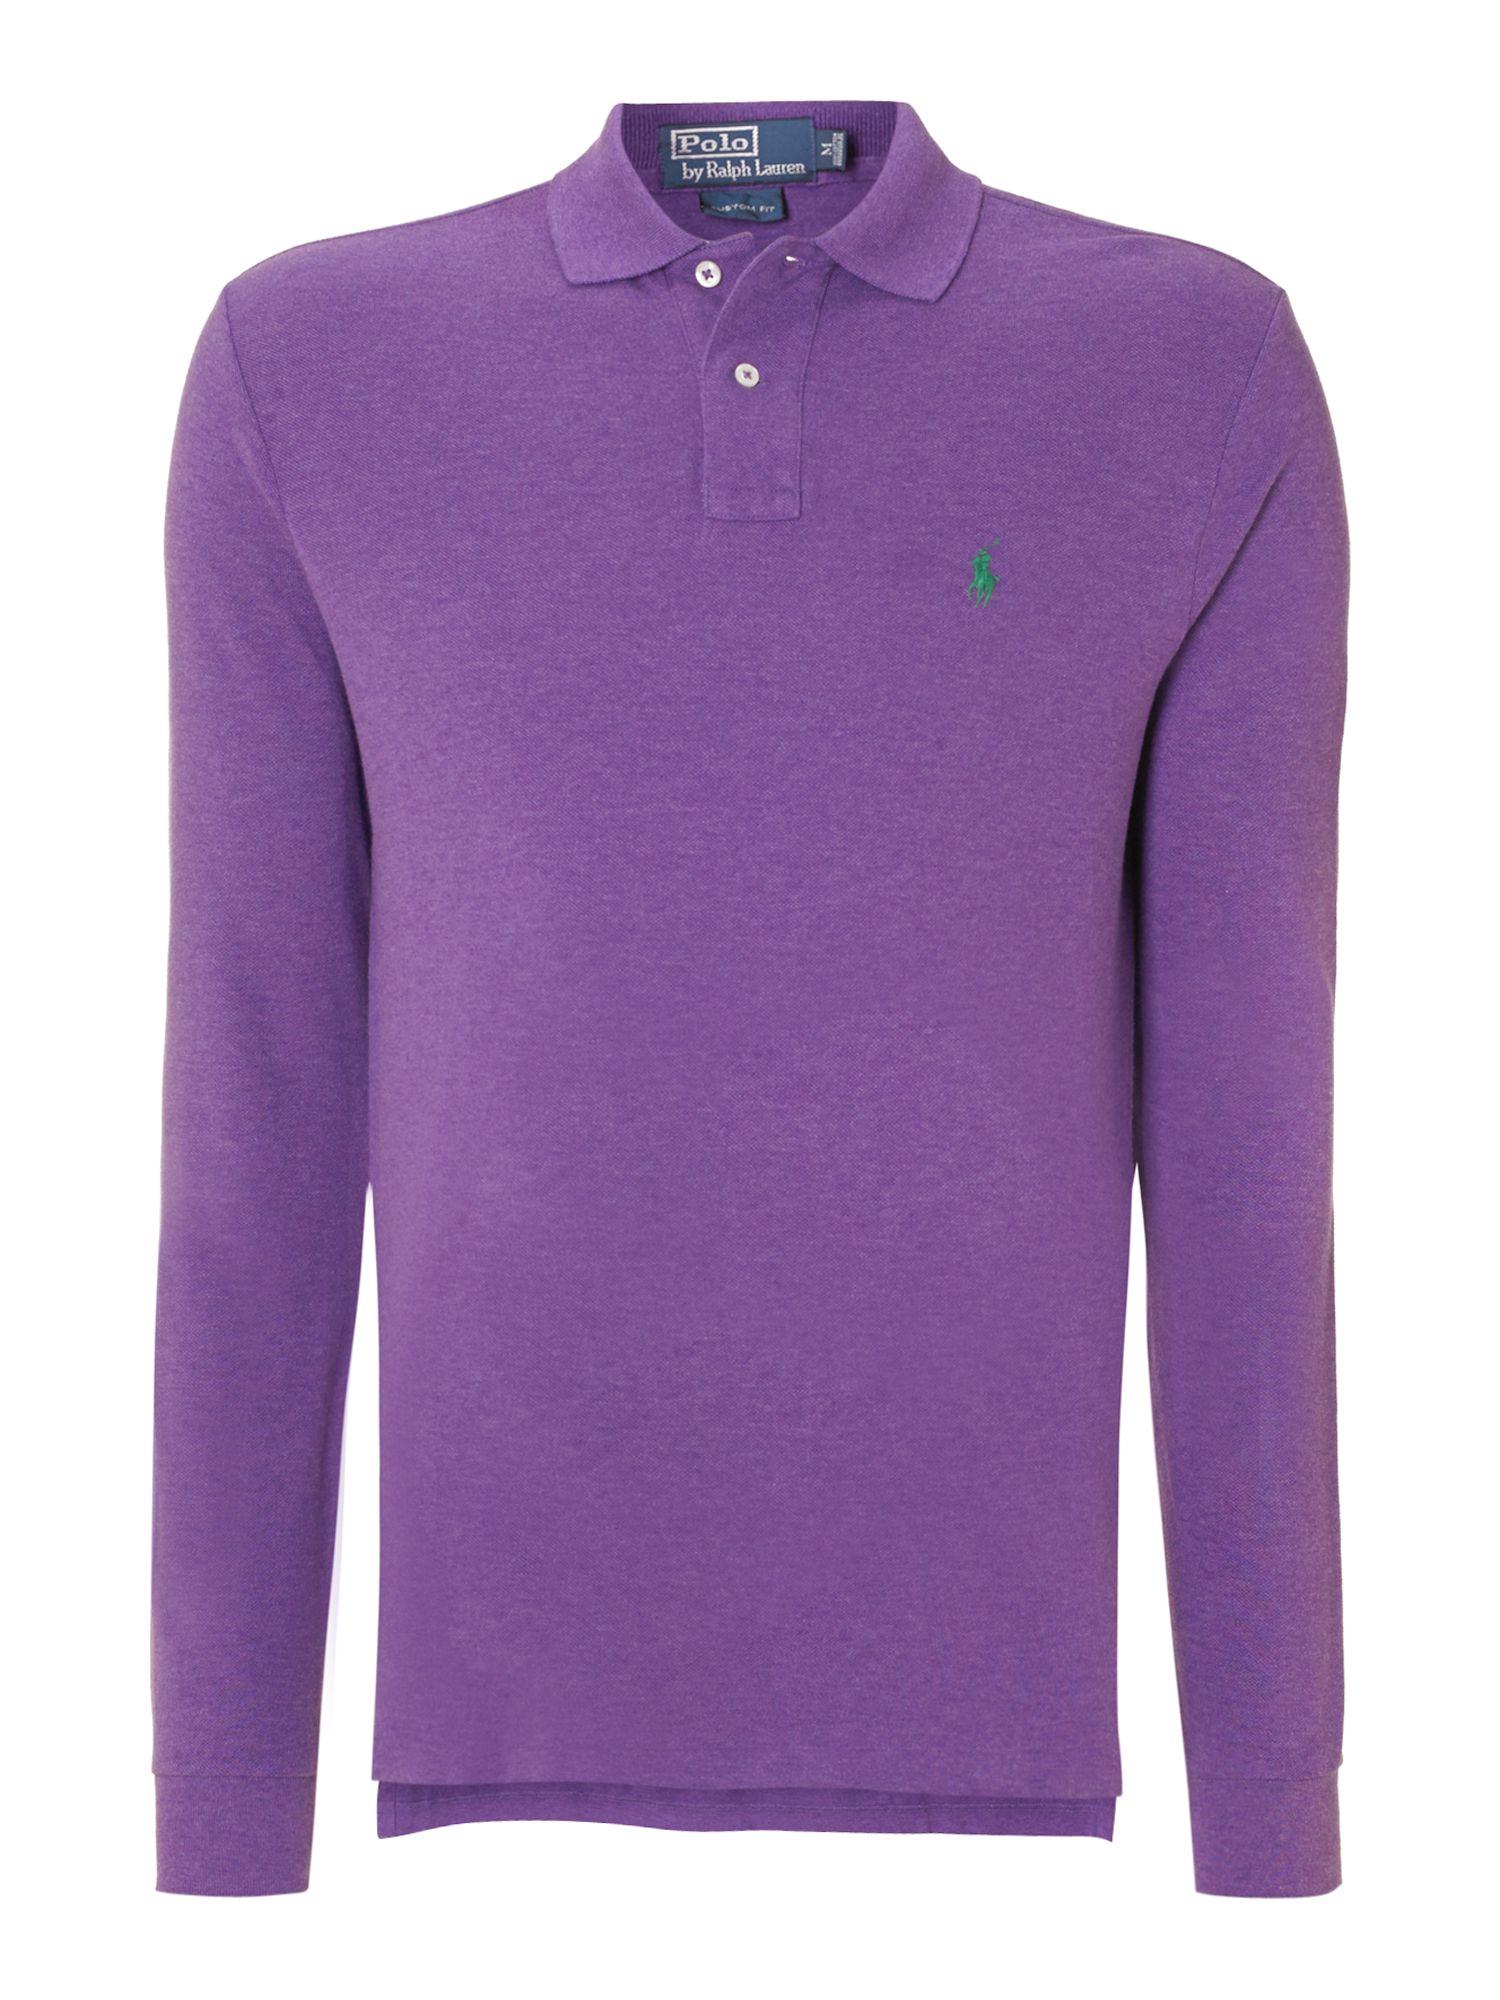 Lyst polo ralph lauren longsleeve polo shirt in purple for Long sleeve purple polo shirt